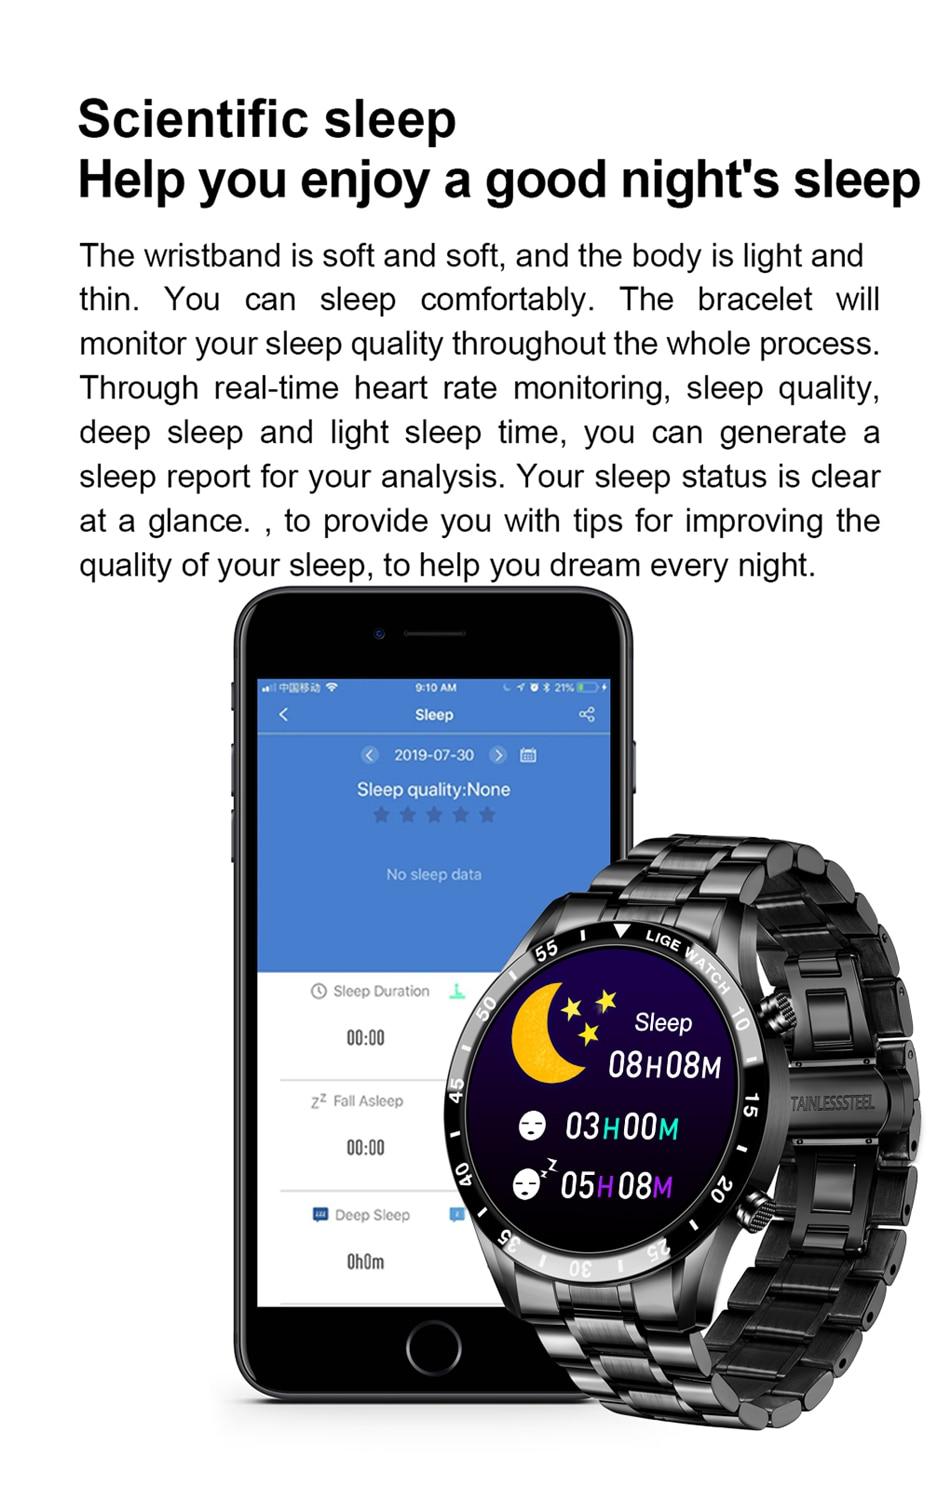 H05db62bce3f8453b9fe115f774bdbb597 LIGE New Men Smart watch Heart rate Blood pressure IP68 waterproof sports Fitness watch Luxury Smart watch male for iOS Android